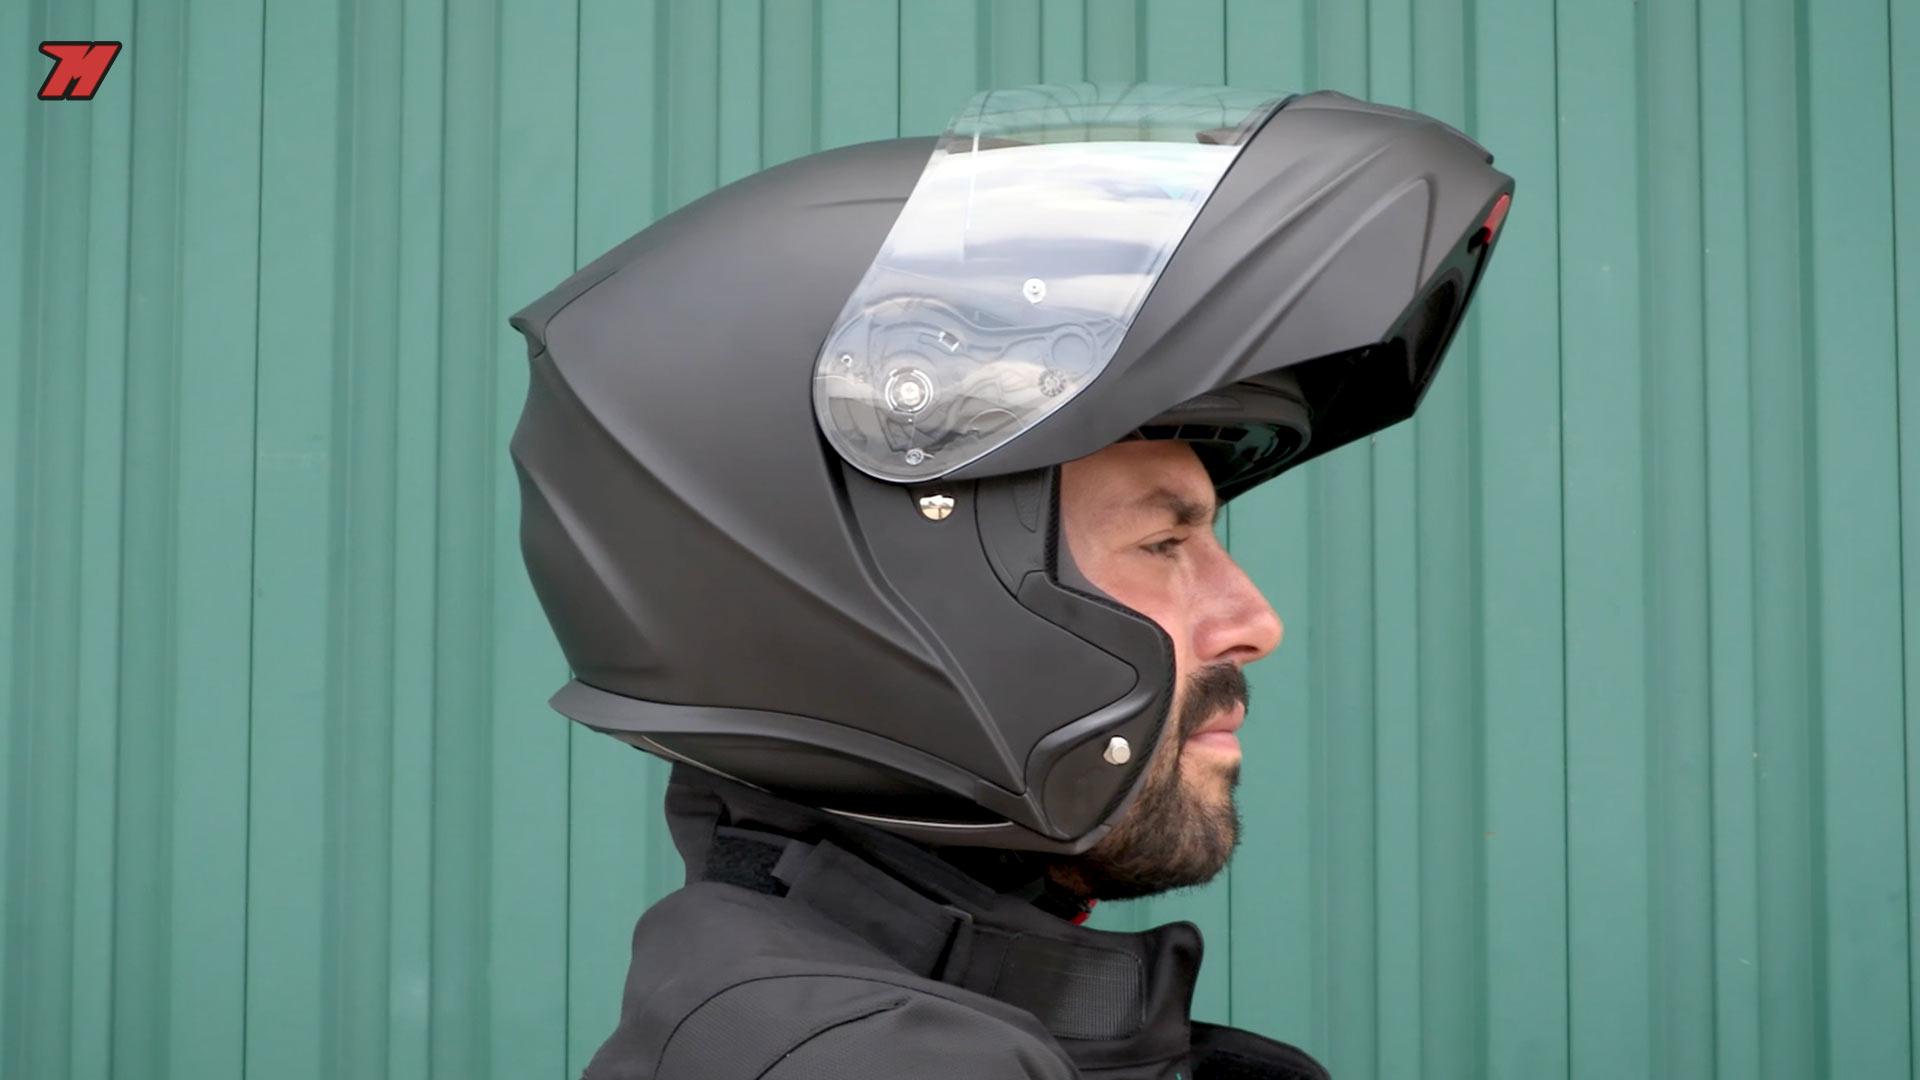 Taille XL SCORPION Casque Motocorpion BELFAST LUXE Noir